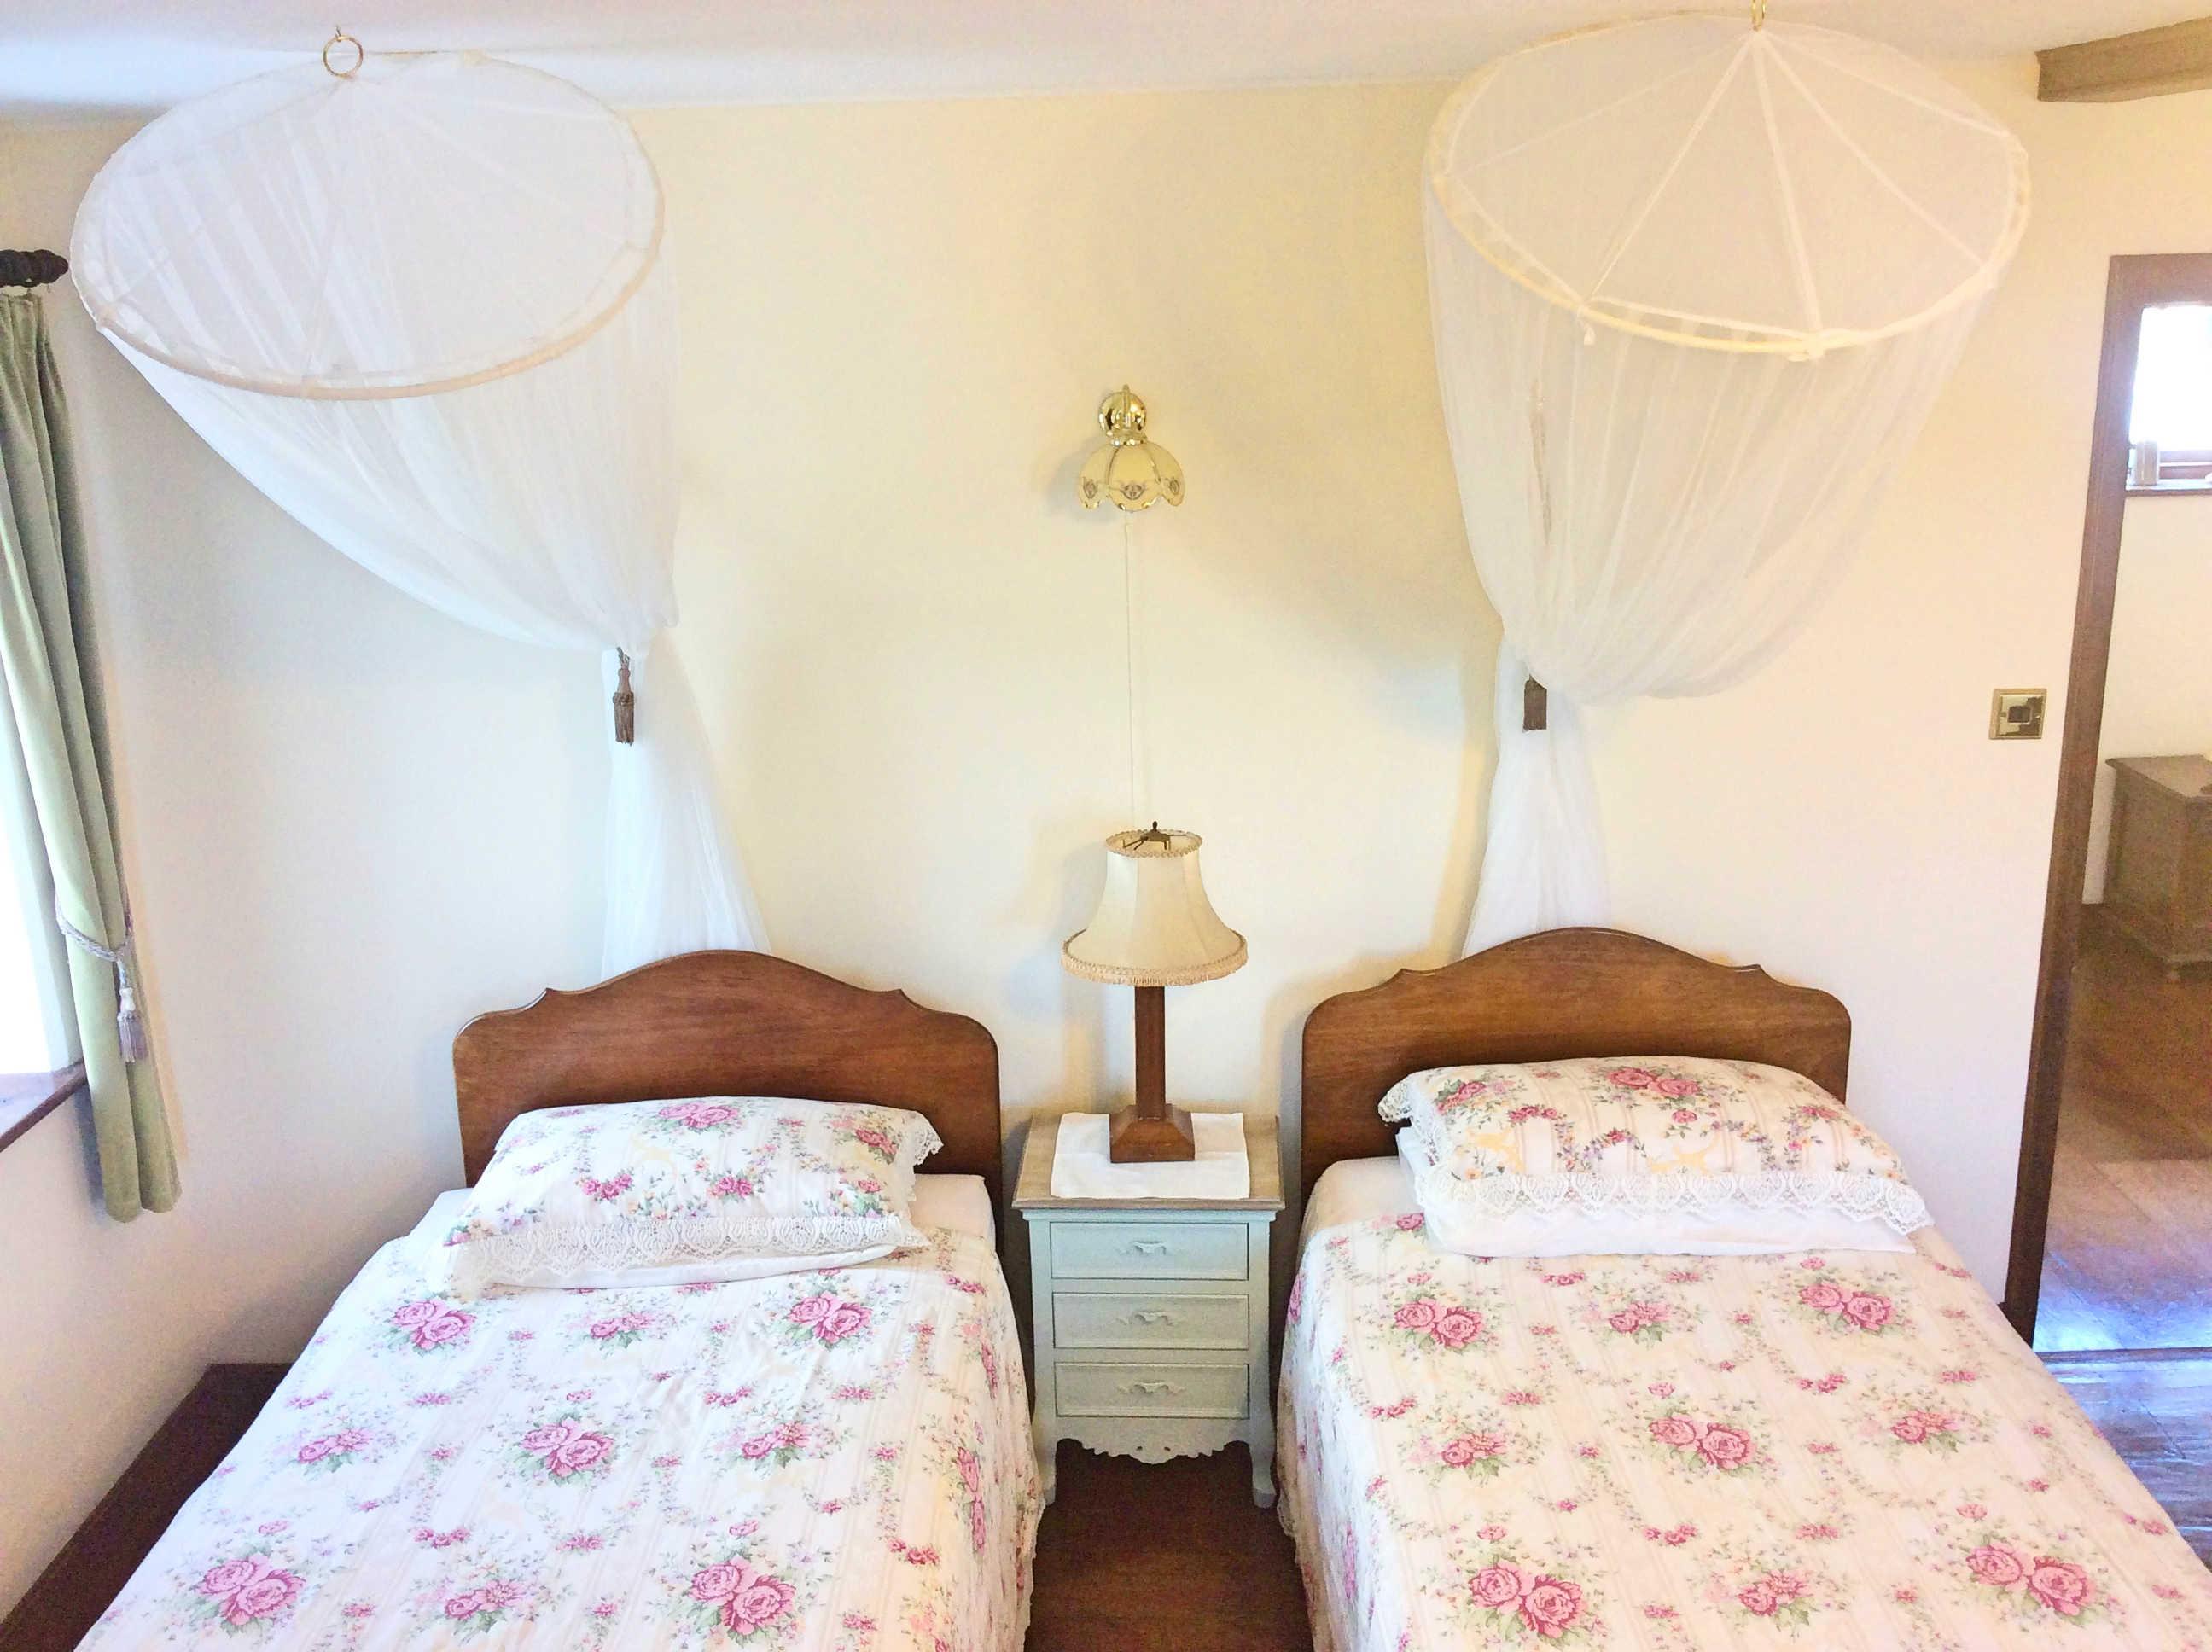 Farm Lodge - Room 1